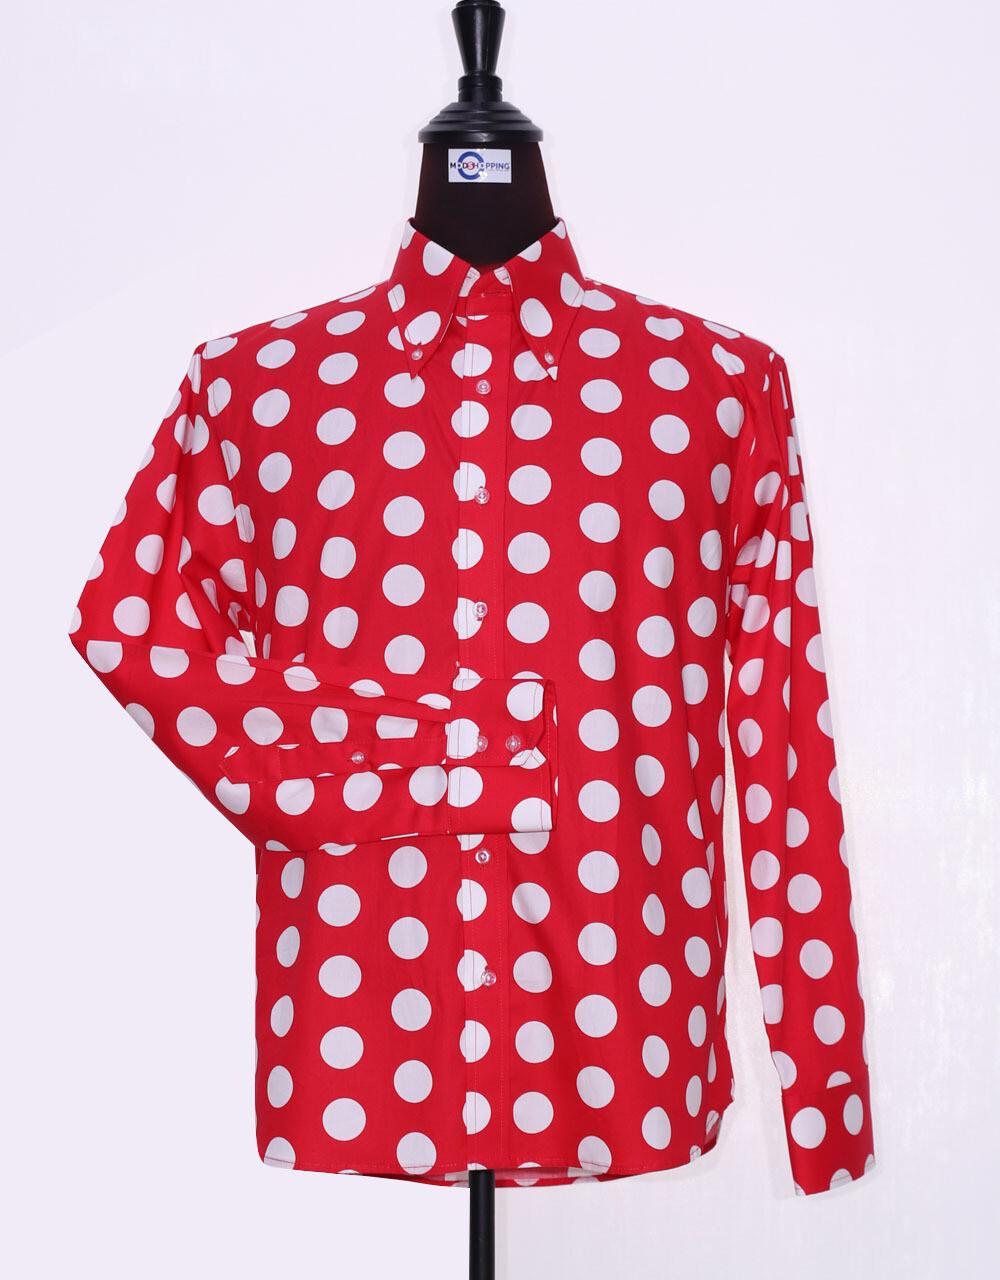 Mod Shirt   Large Red Polka Dot Shirt